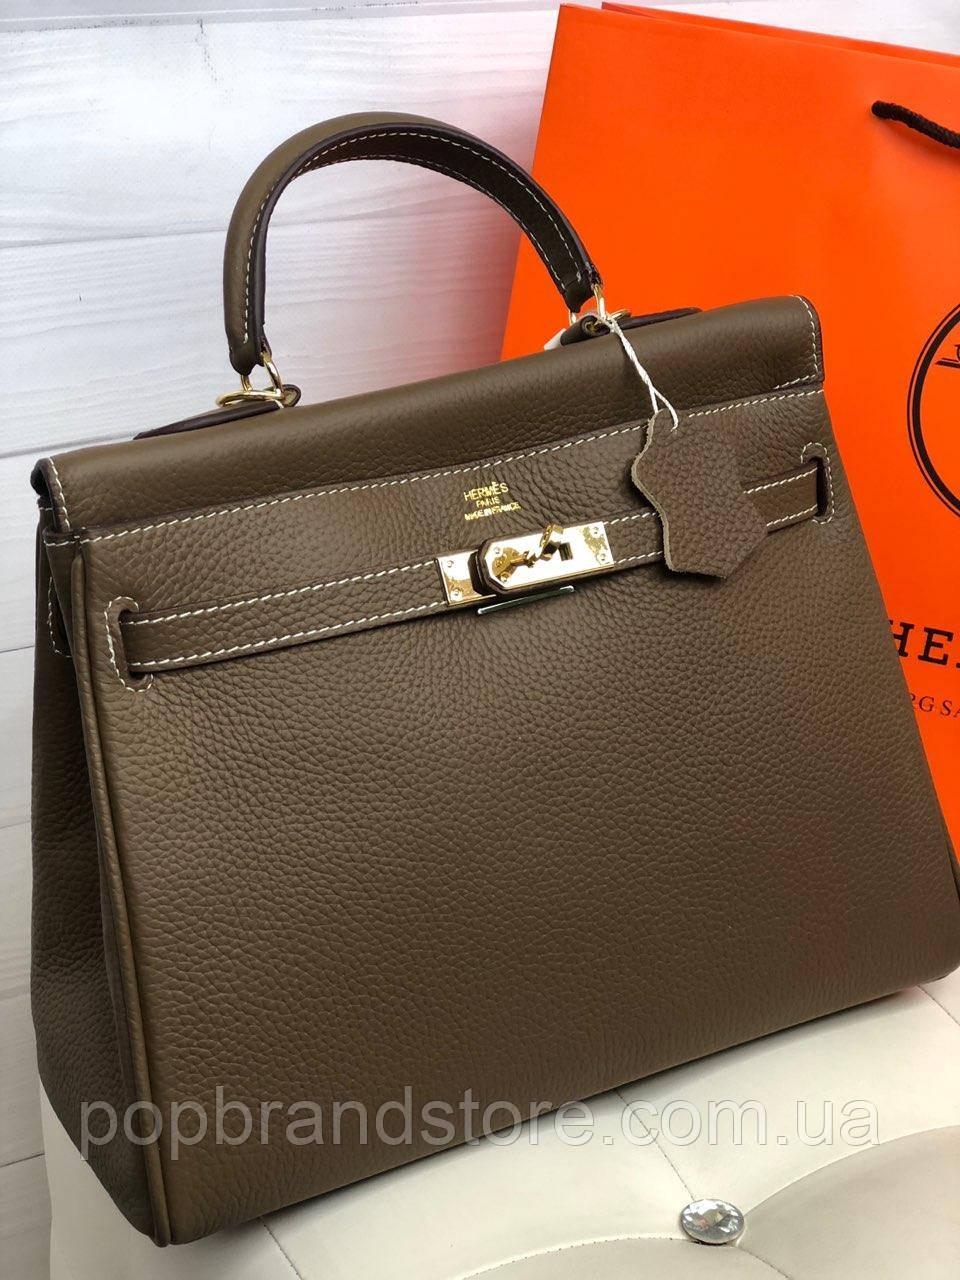 546358d98762 Женская сумка Гермес келли 32 см моко (реплика) - Pop Brand Store    брендовые